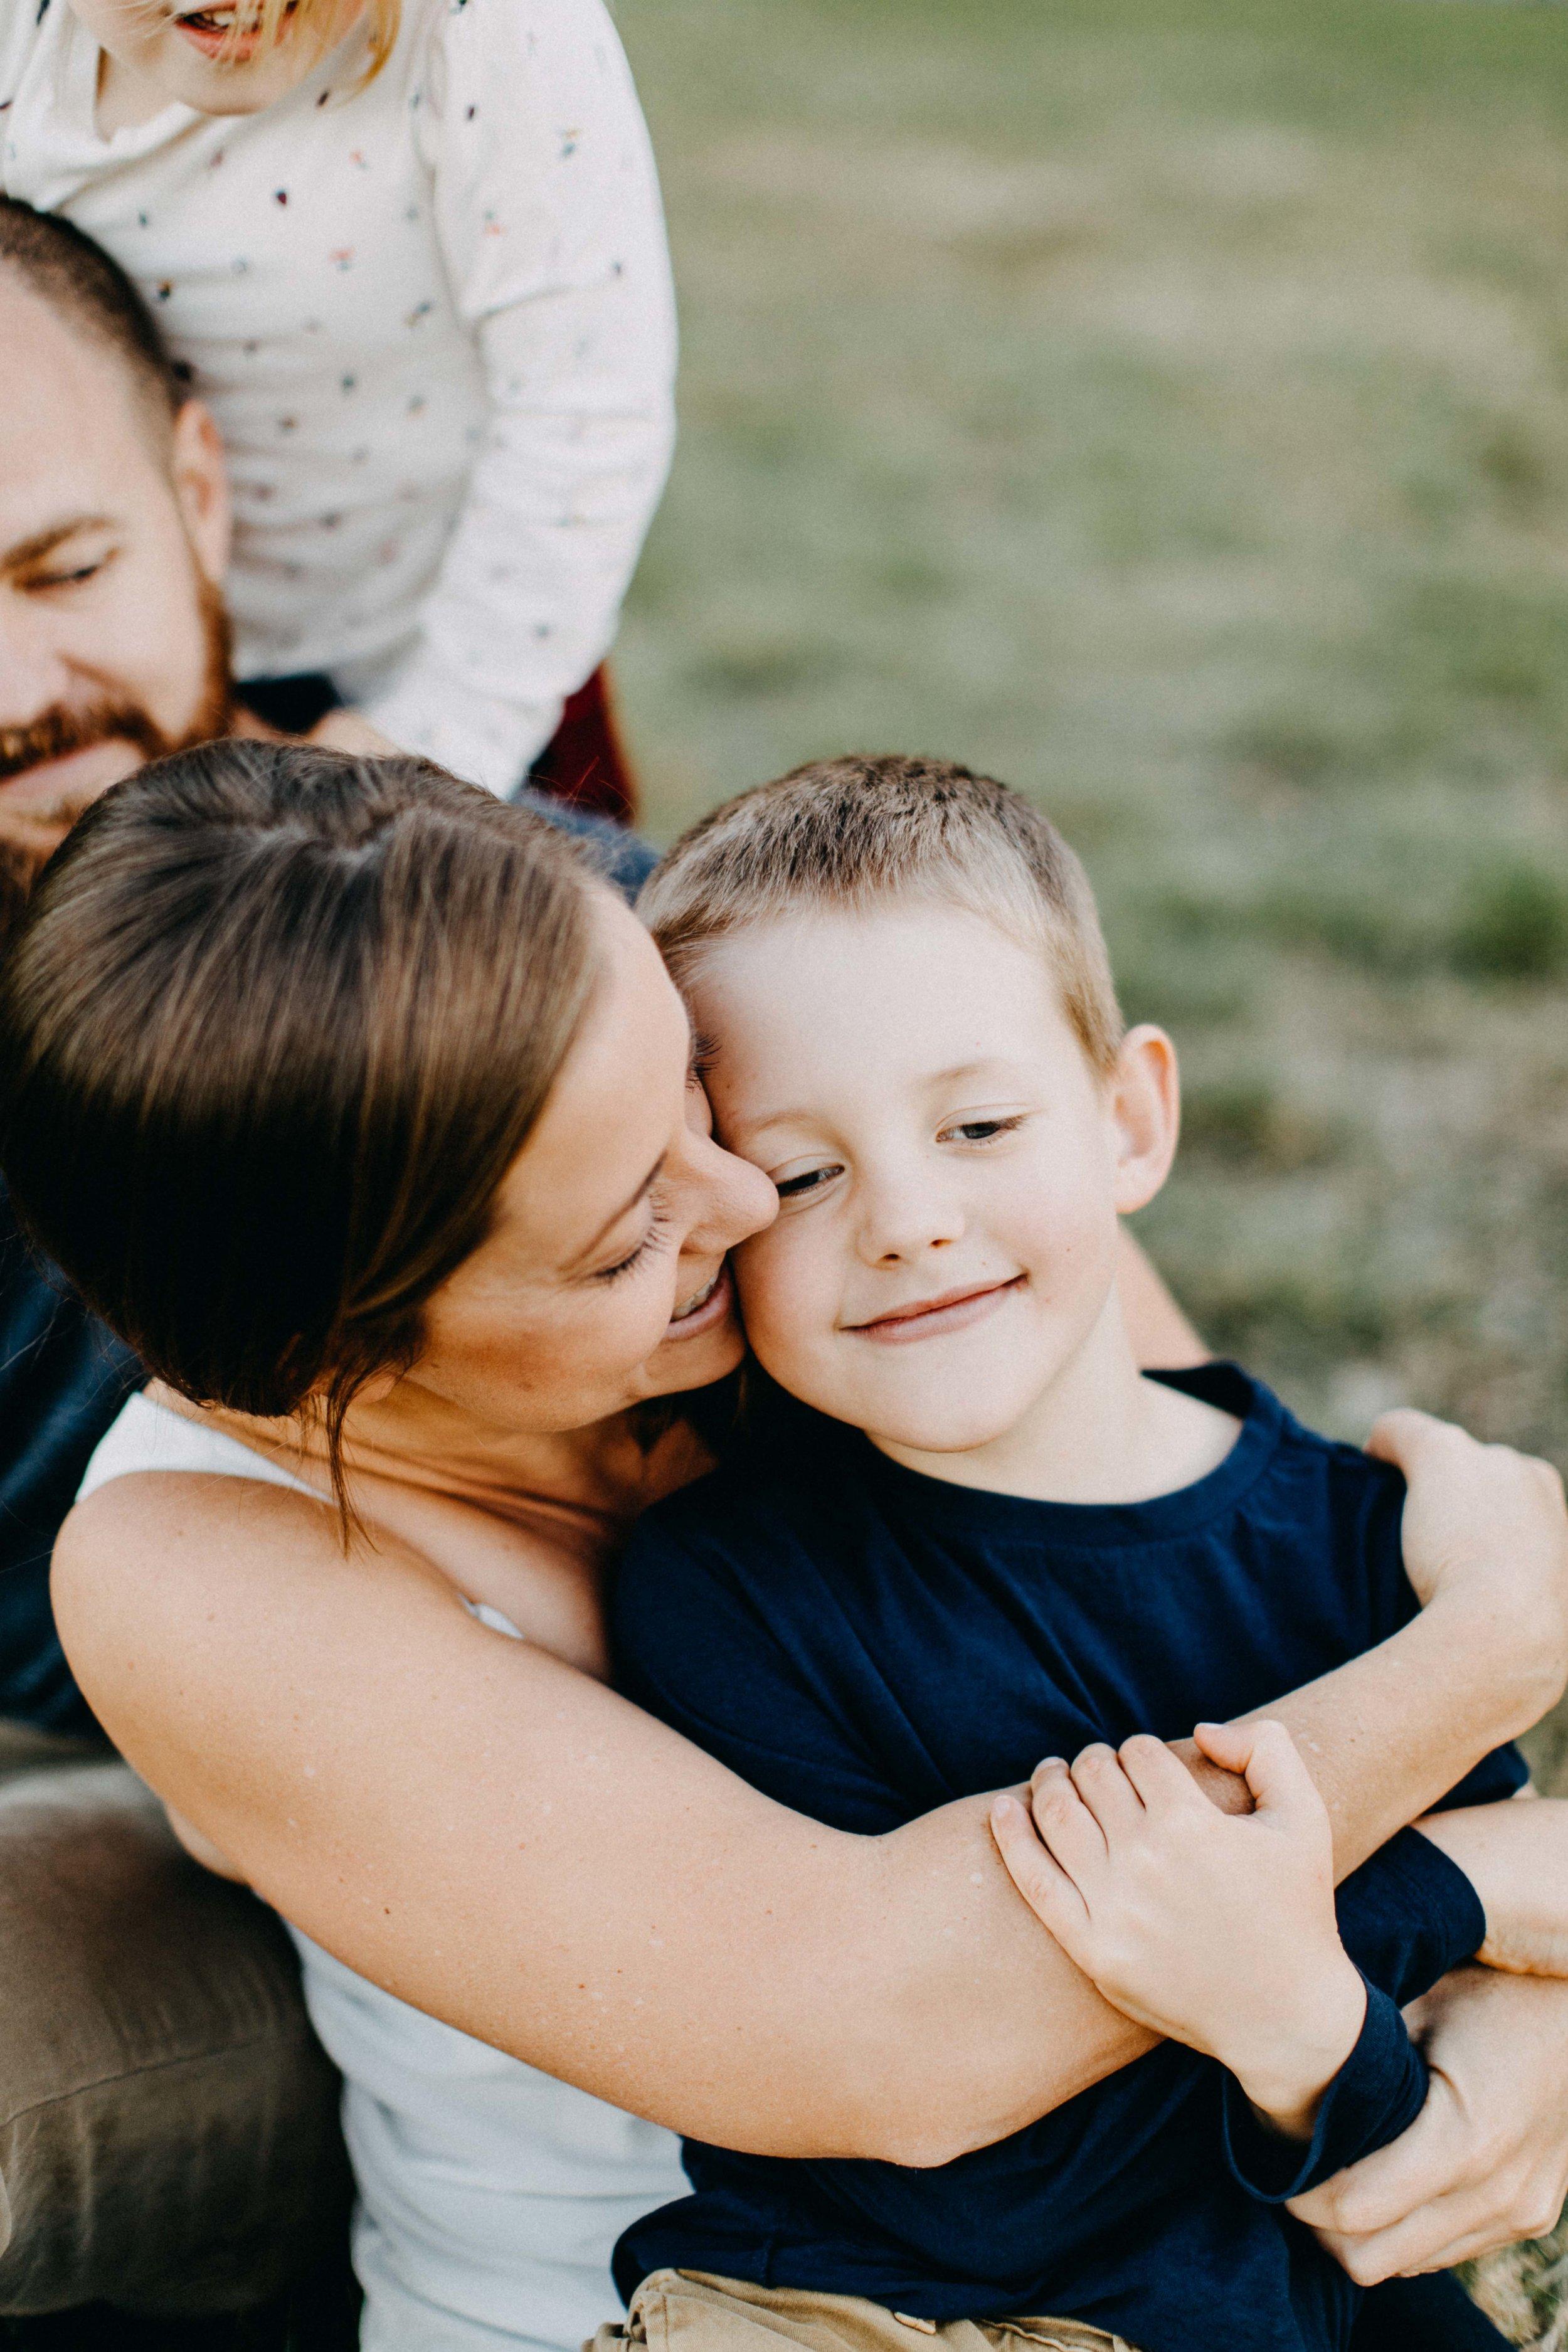 camden-family-photography-boot-family-session-38.jpg